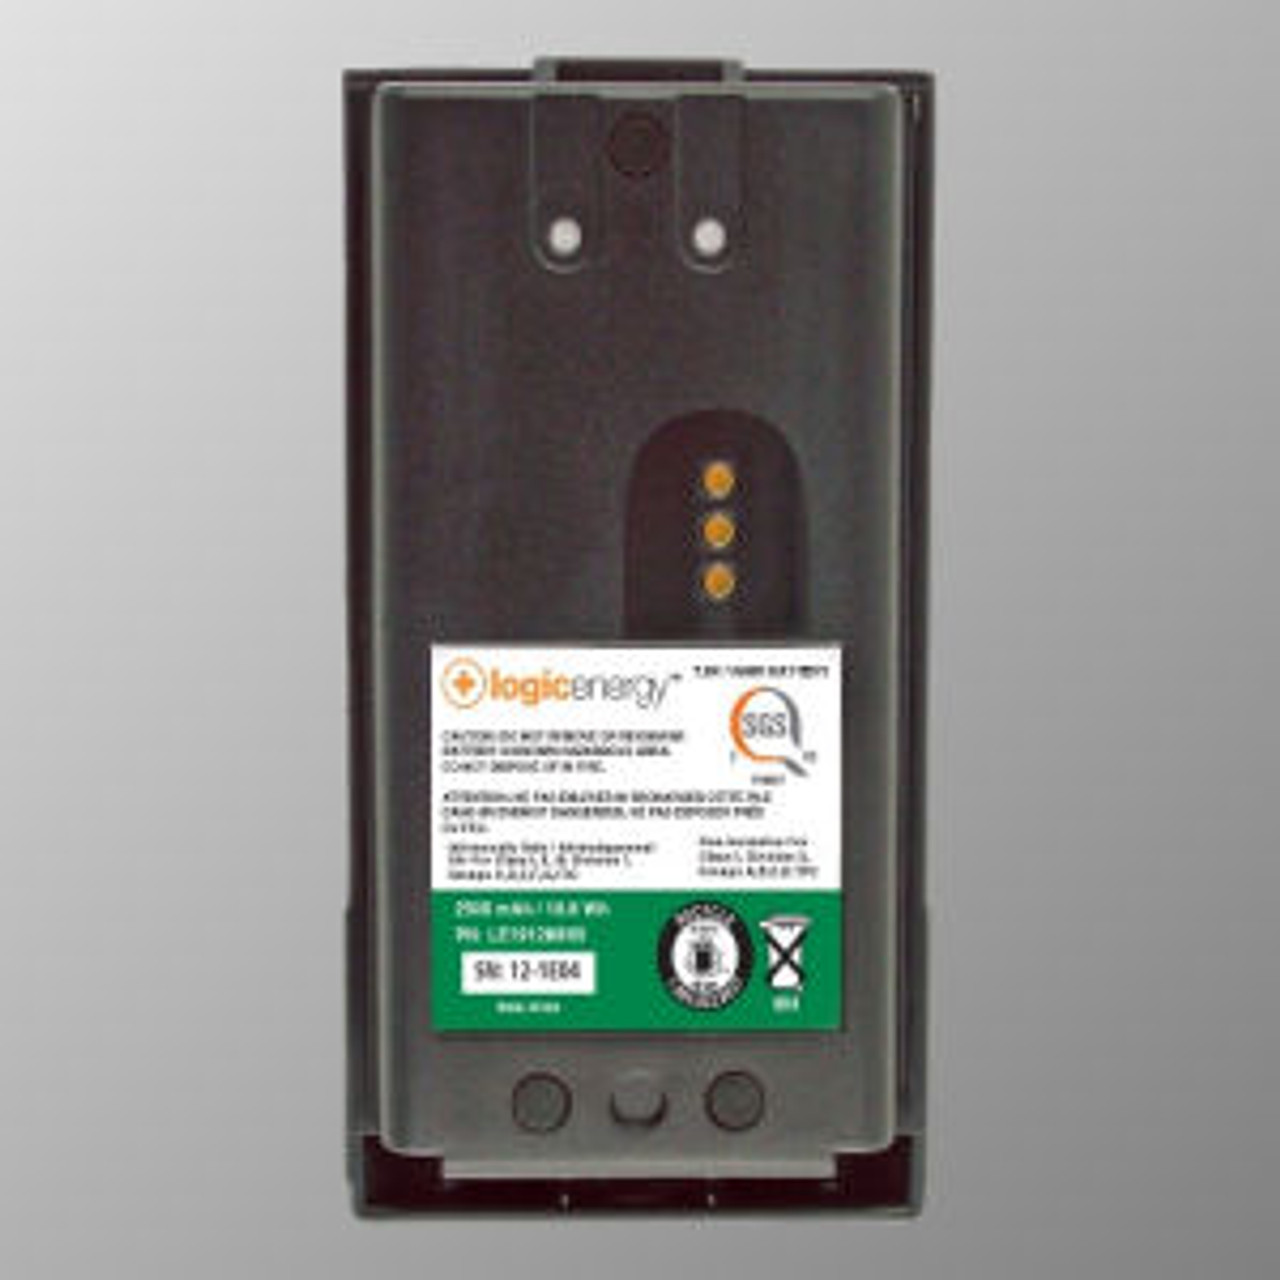 M/A-Com P5200 Intrinsically Safe Battery - 2500mAh Ni-MH